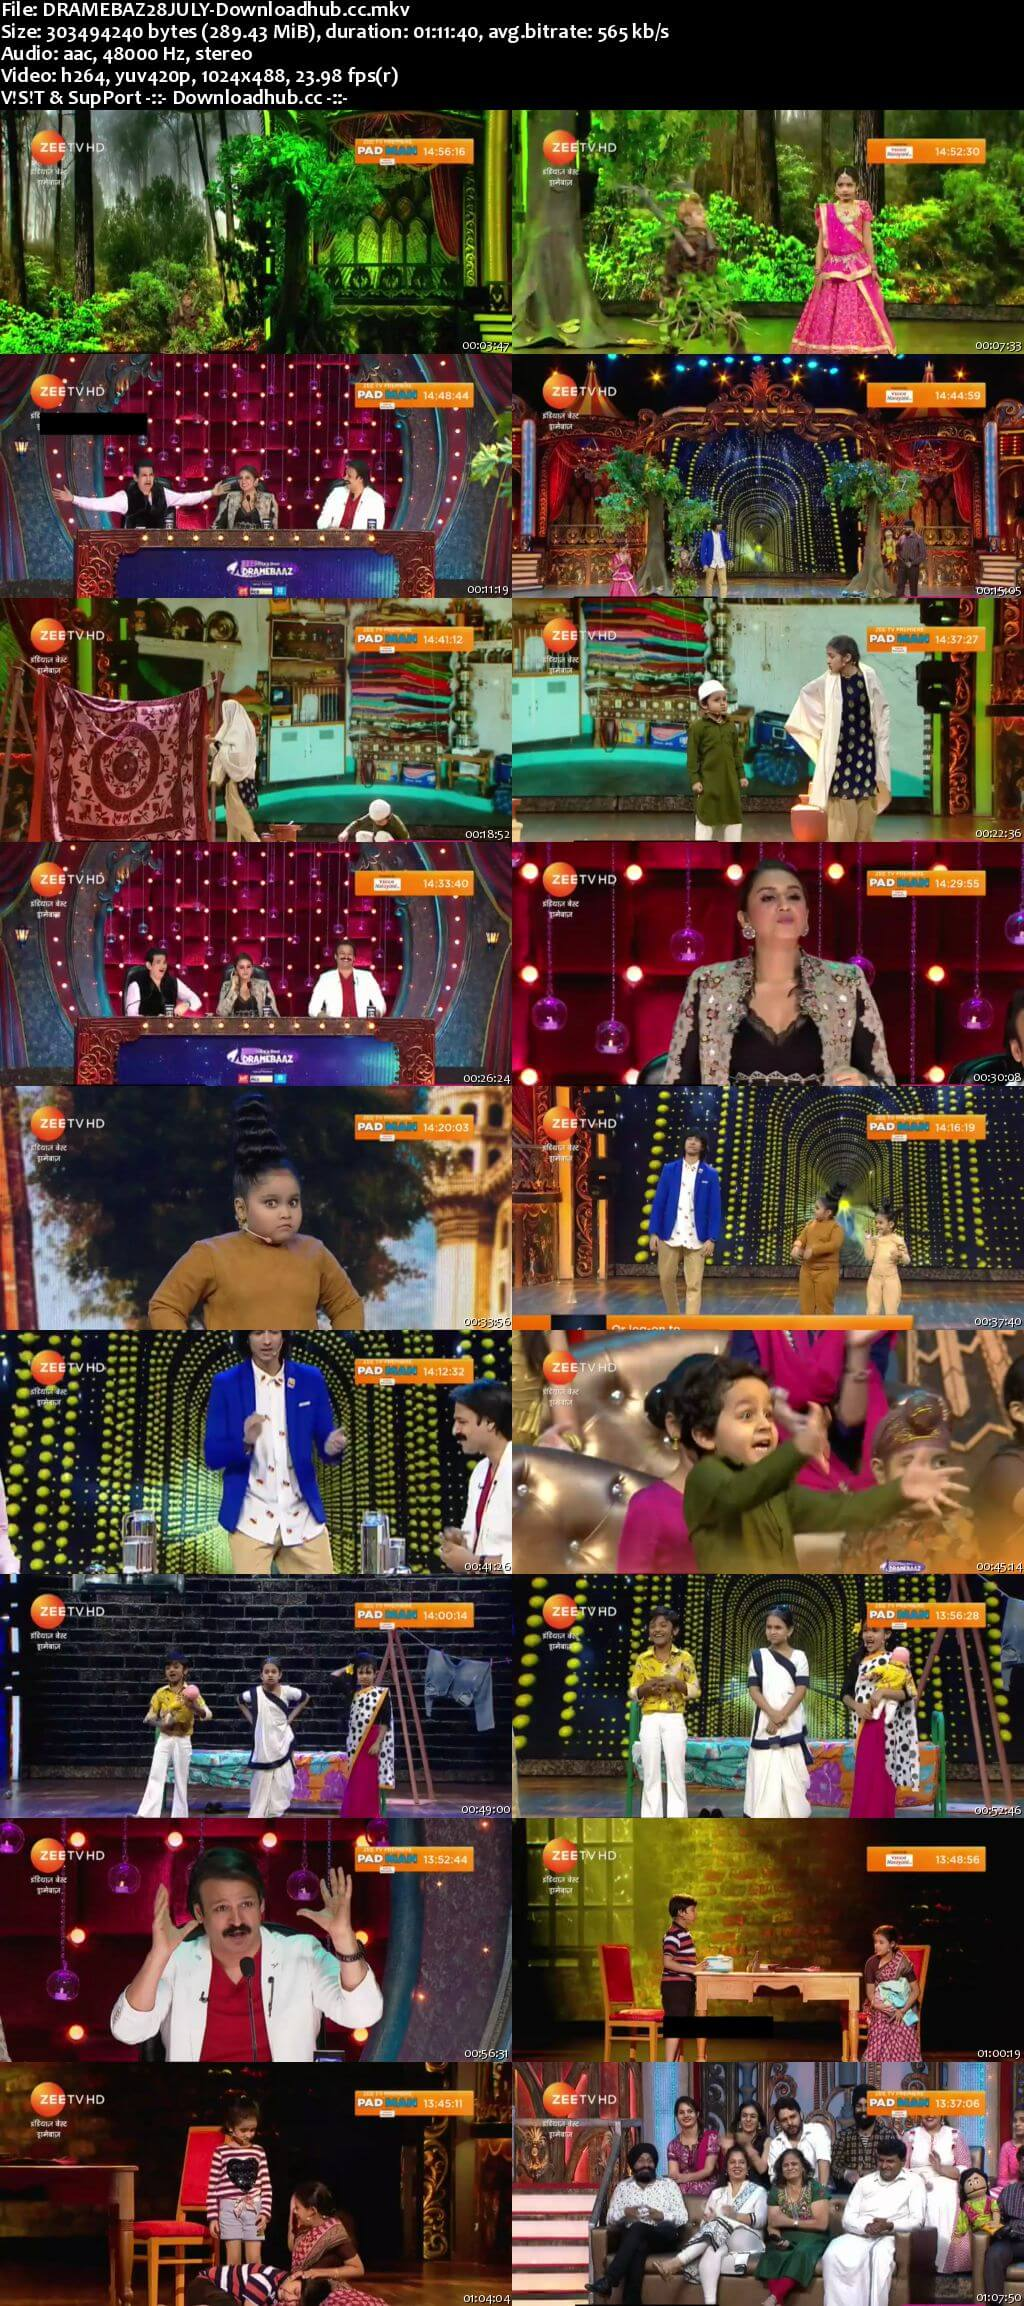 Indias Best Dramebaaz Season 3 28 July 2018 Episode 09 HDTV 480p